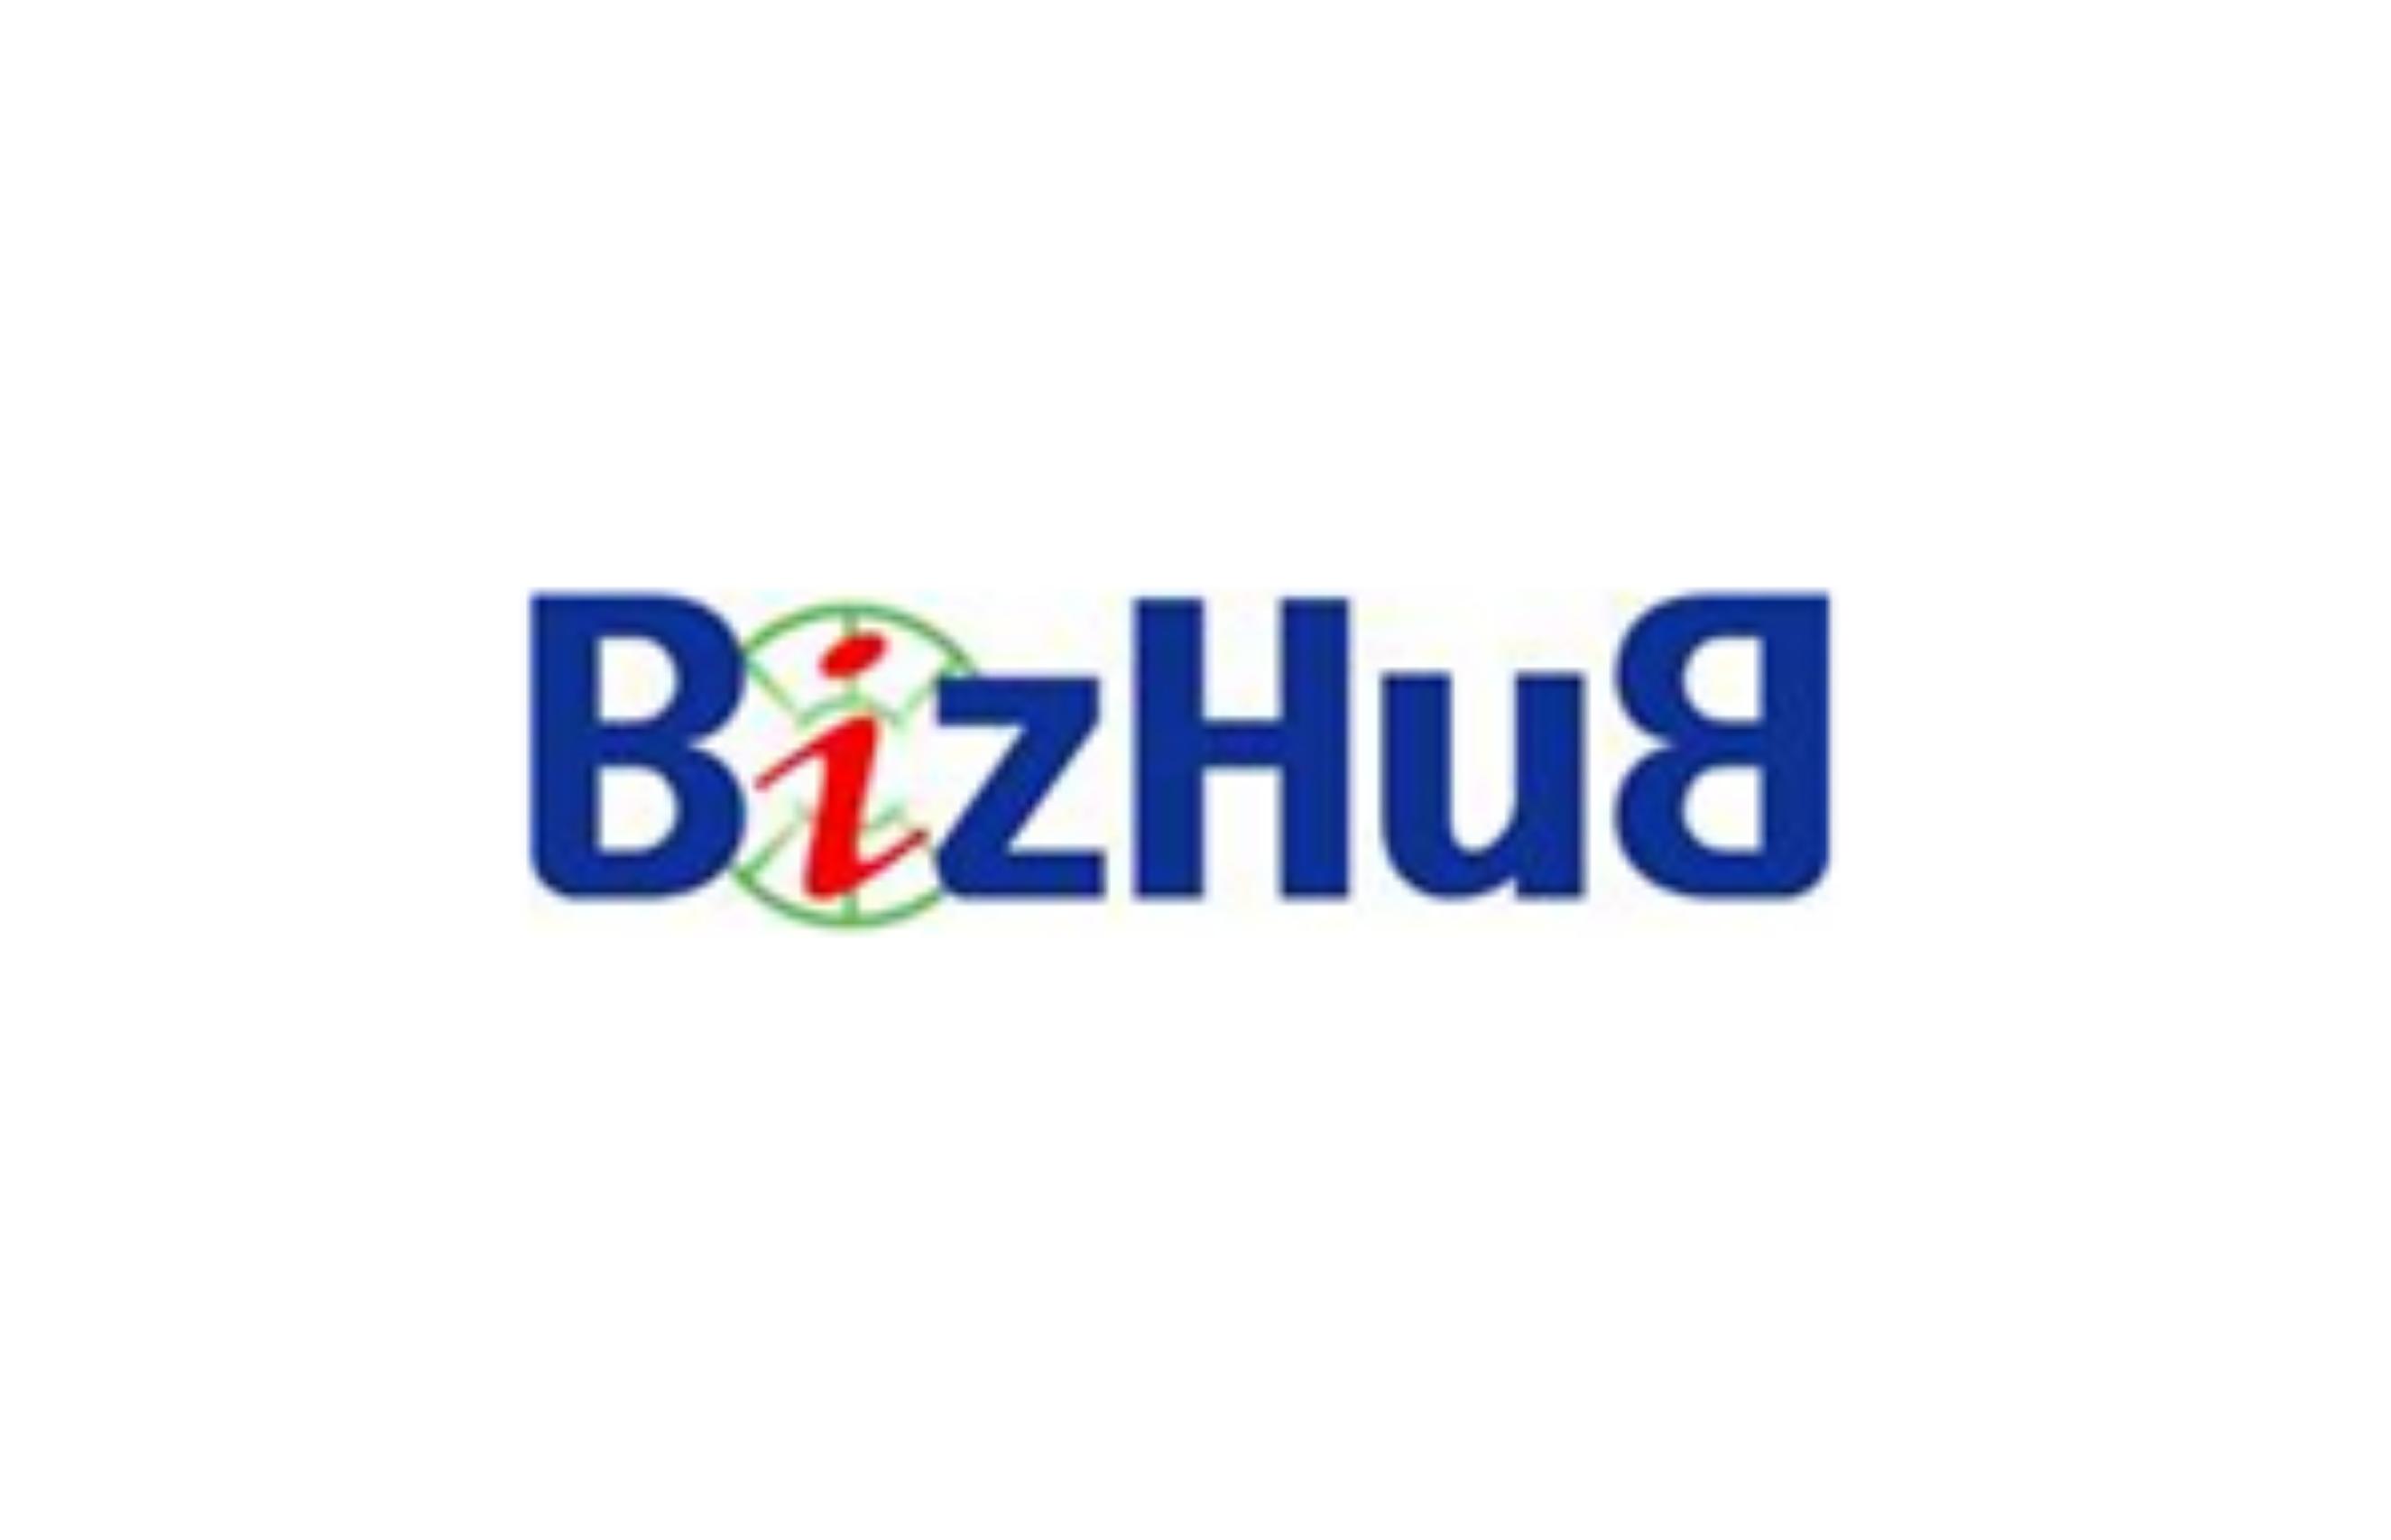 BizHub Co